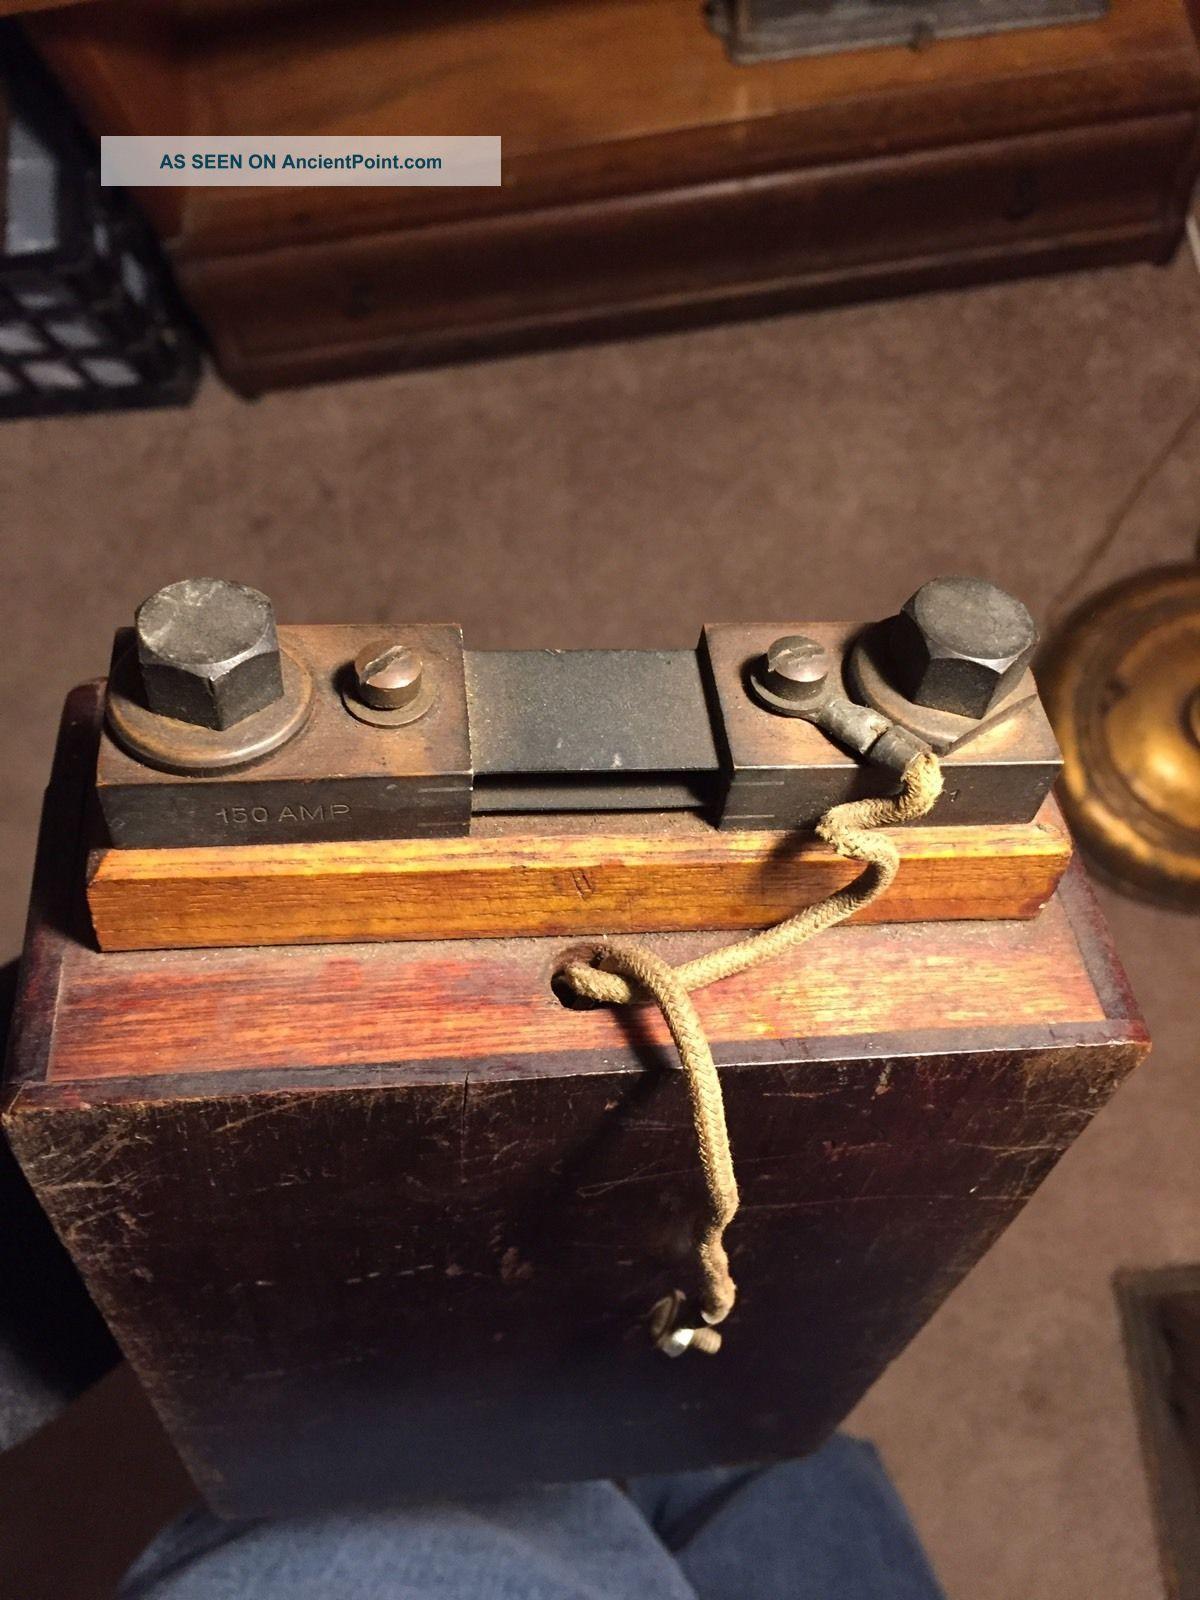 Antique Weston Ammeter Dual Voltmeter In Wood Case Model 267